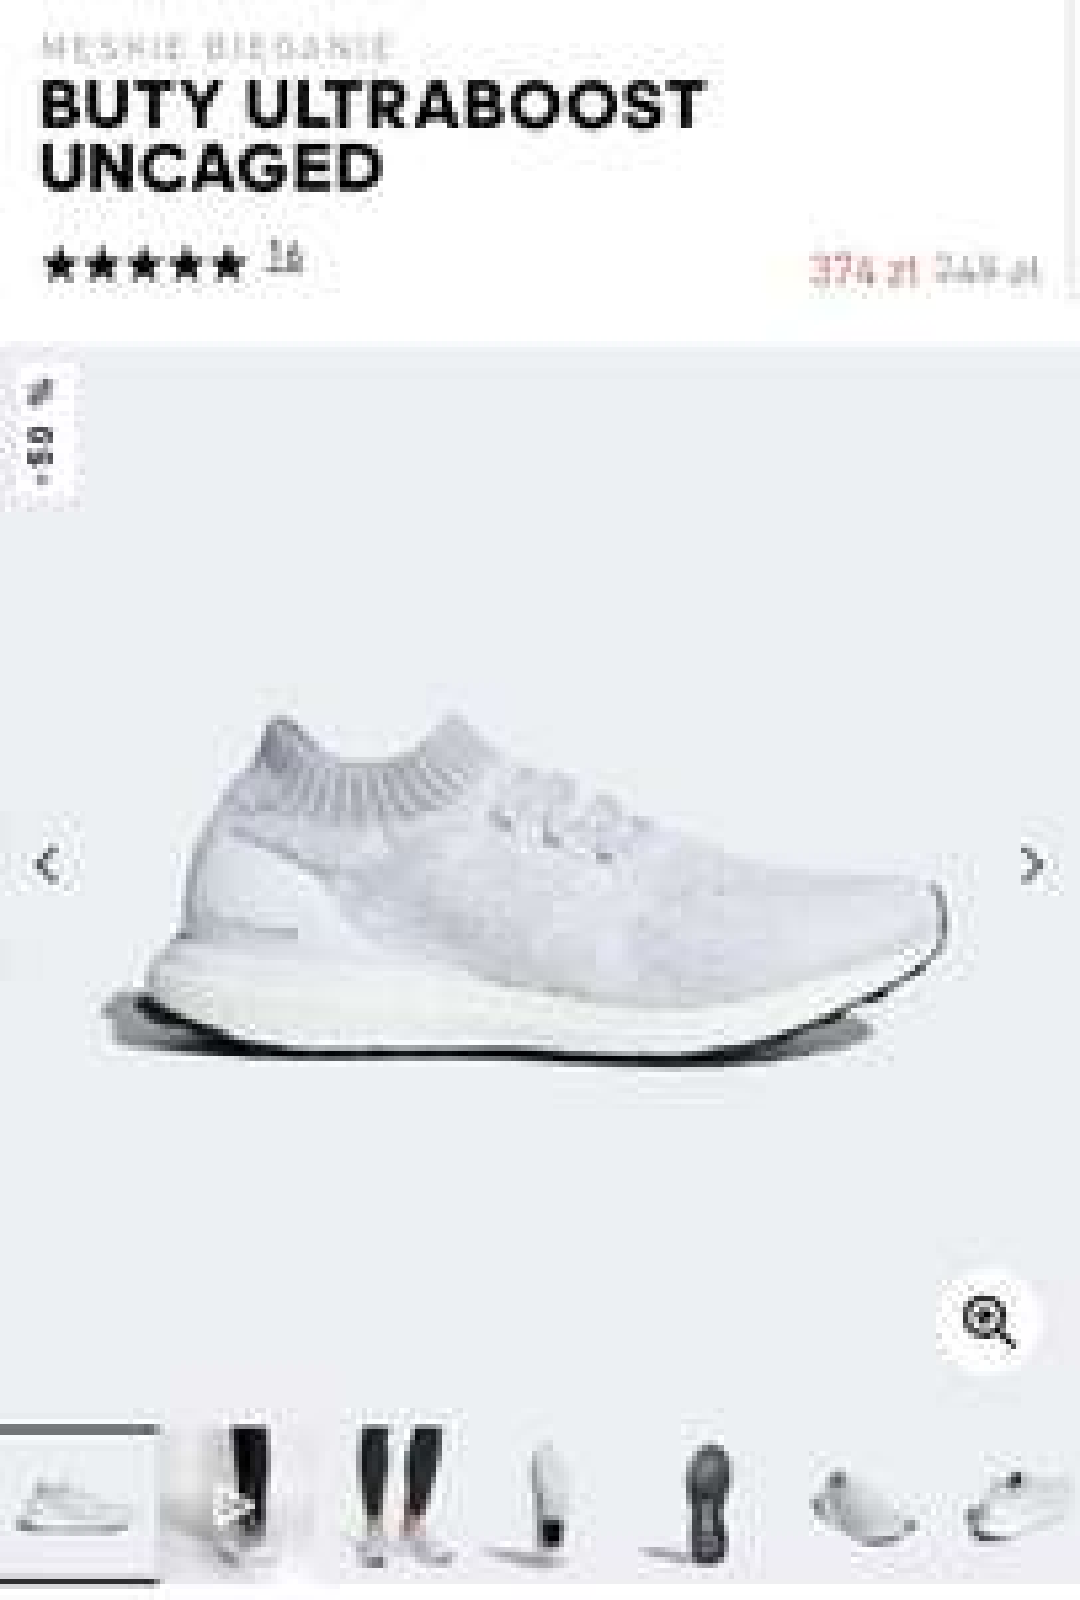 Adidas ULTRABOOST Uncaged CyberMonday